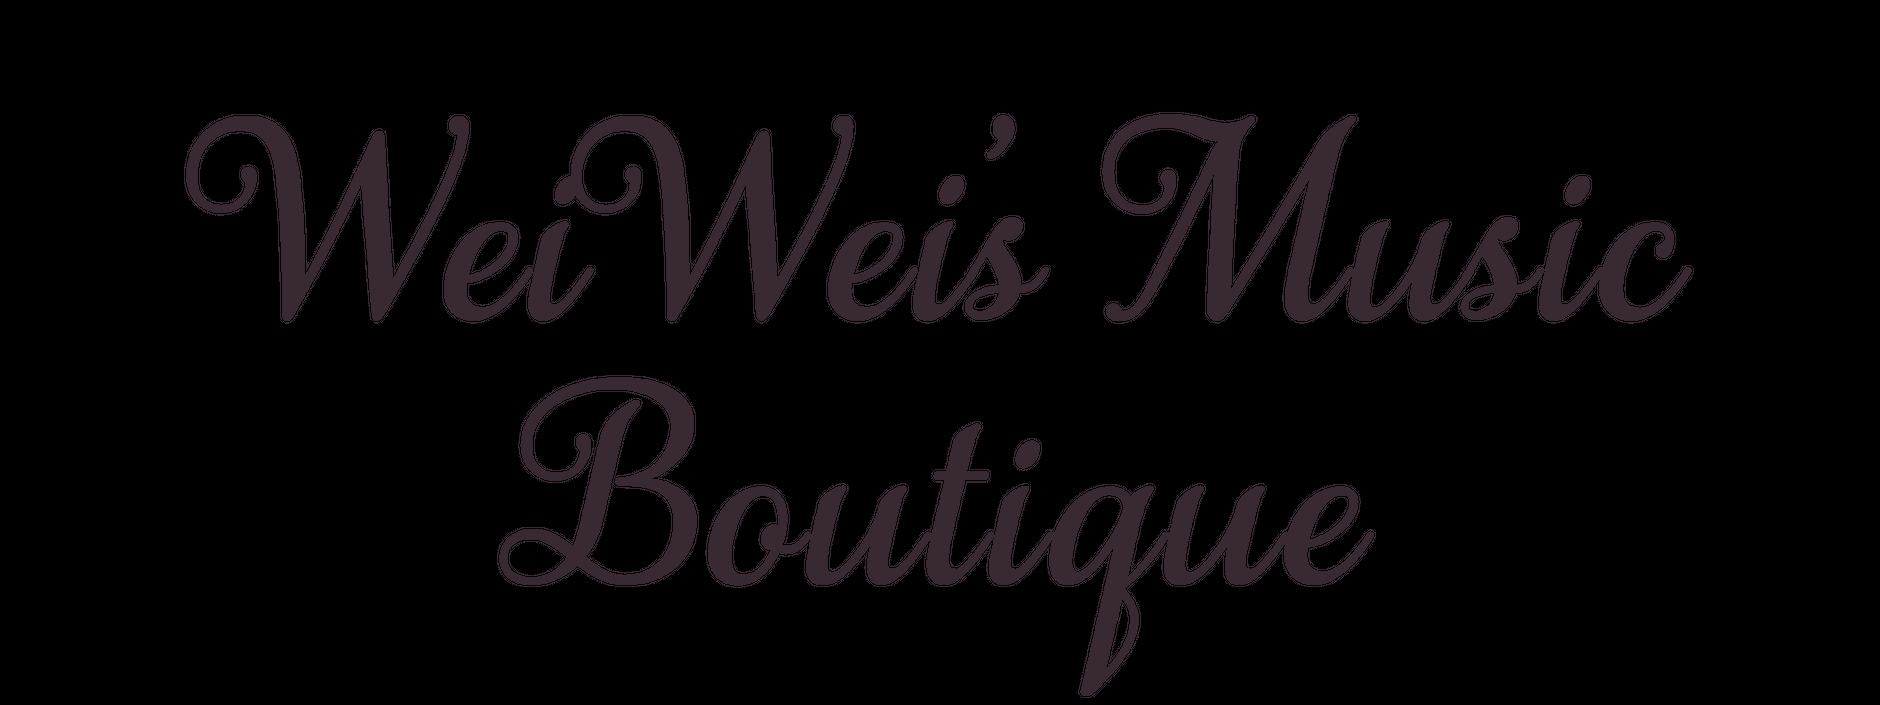 WeiWei's Music Boutique